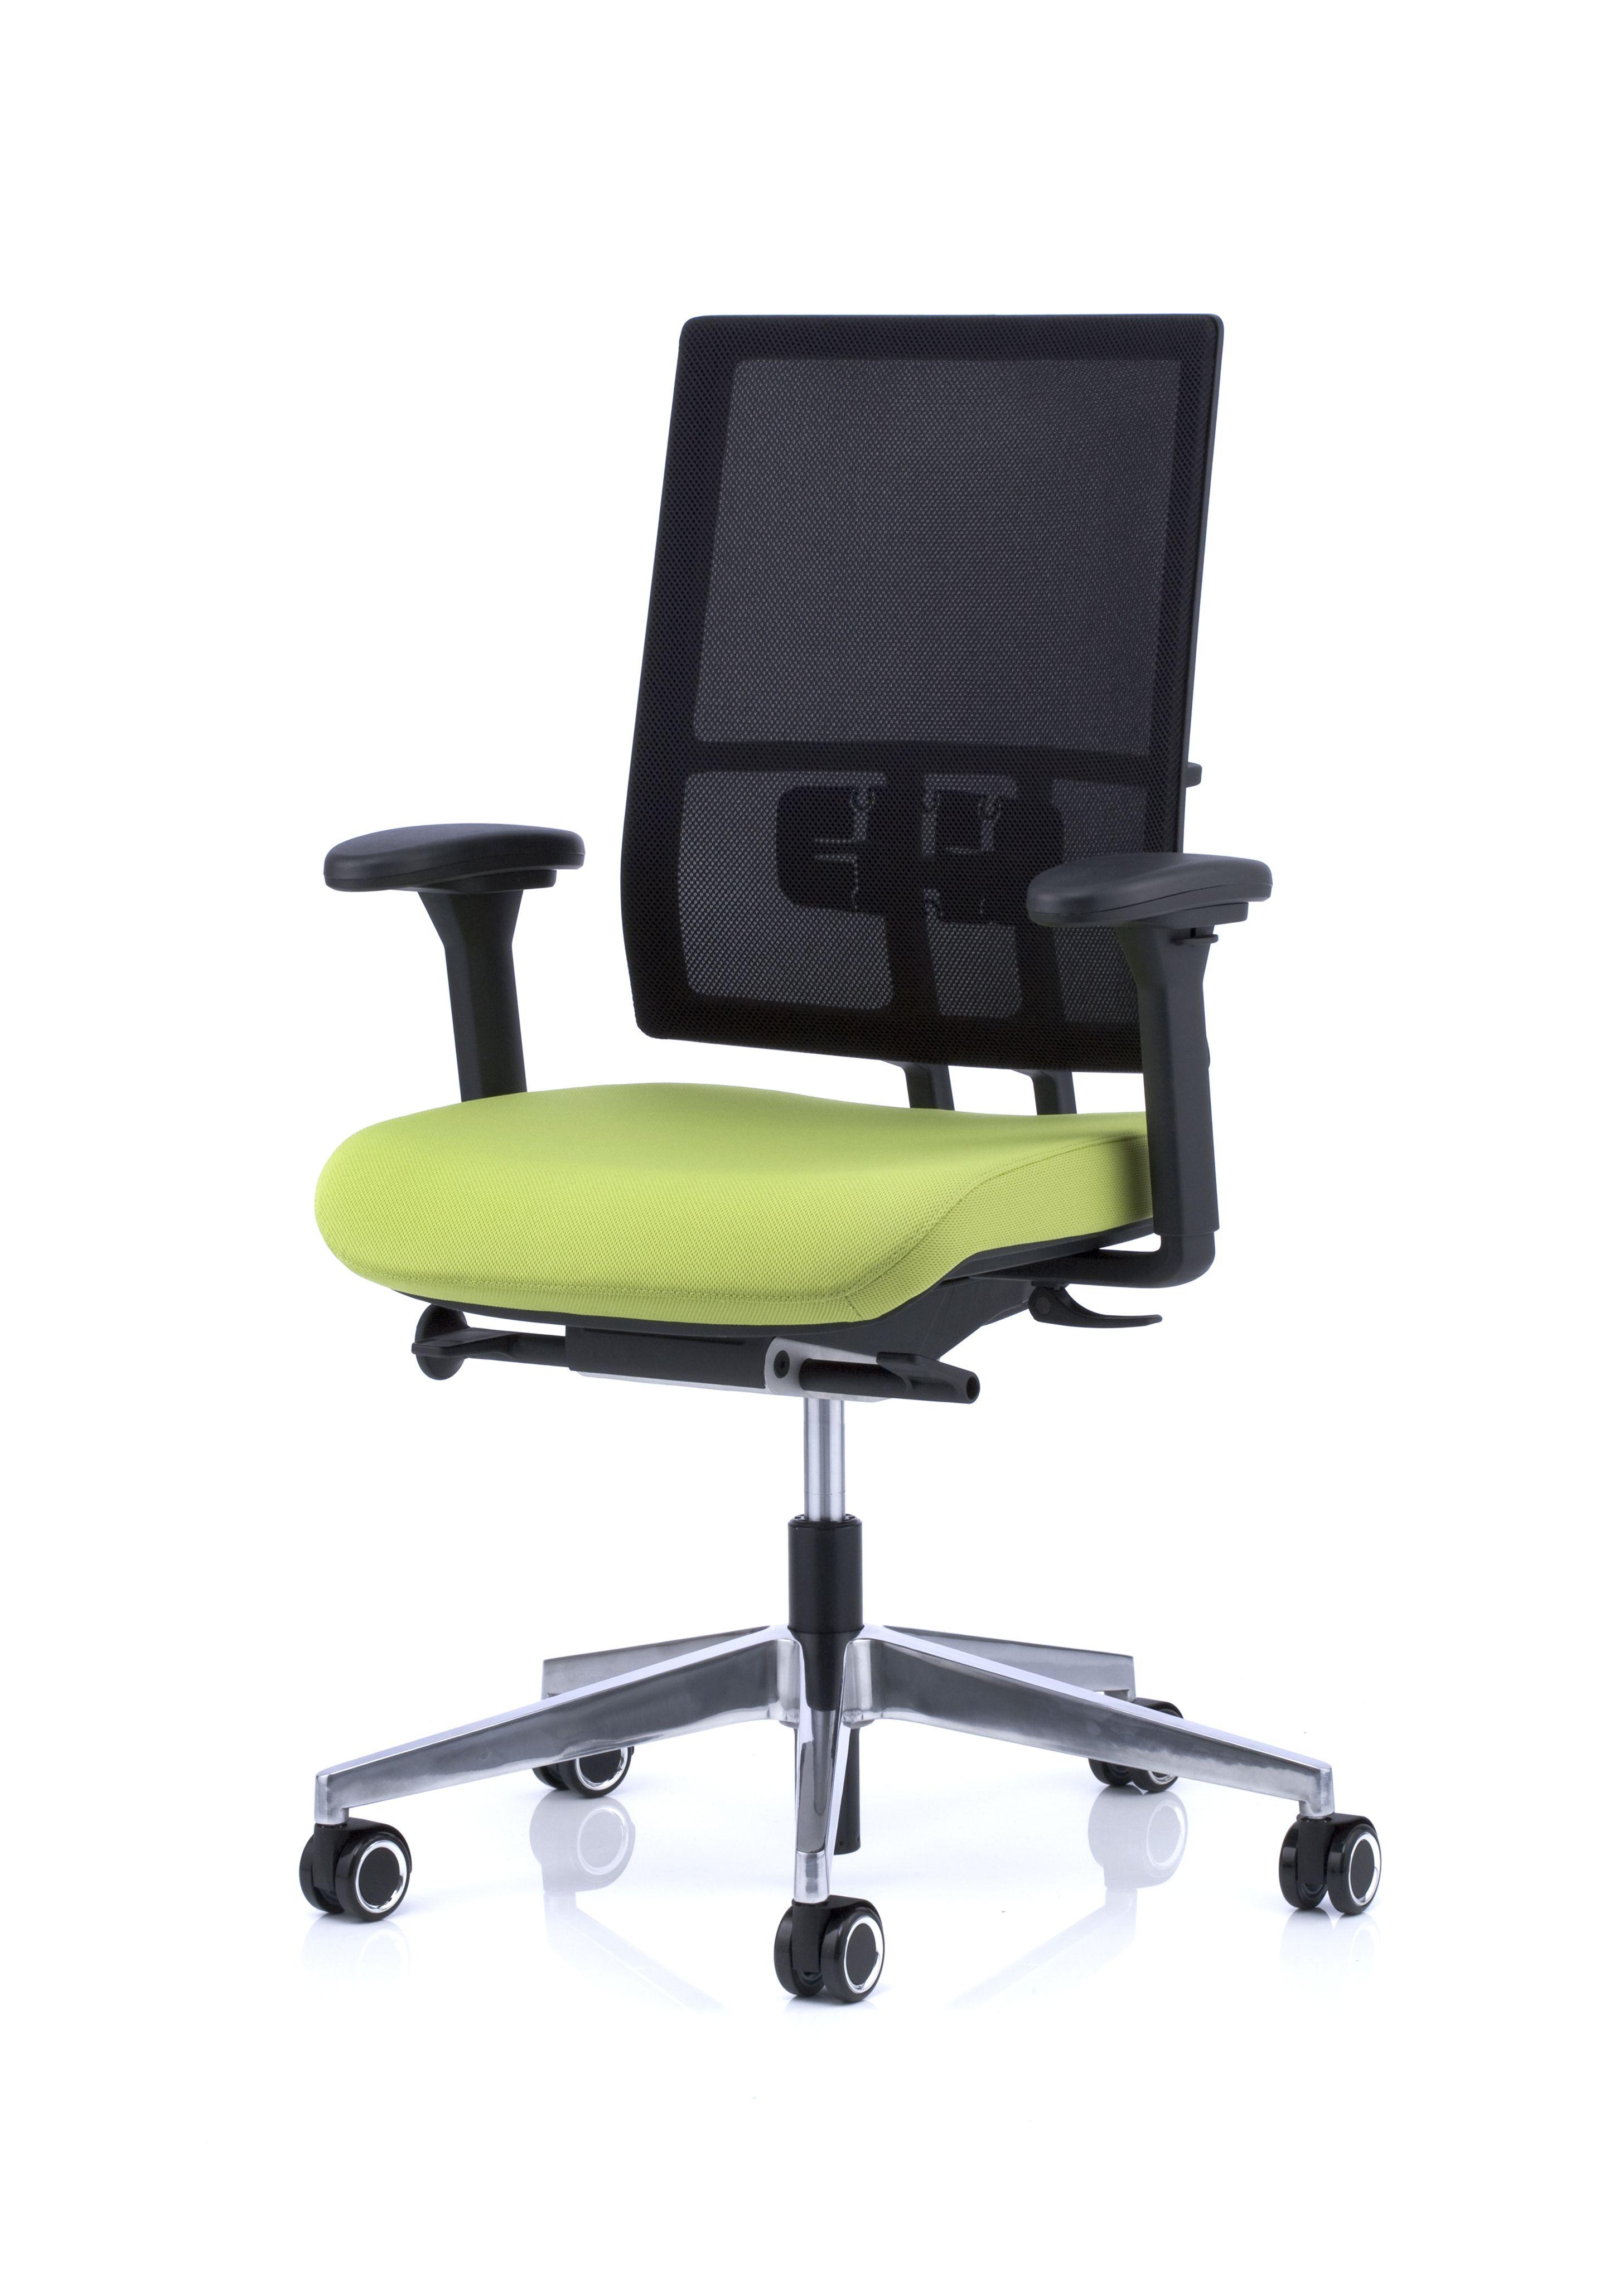 Anteo orthopedic task chair koehl Kohl Seating